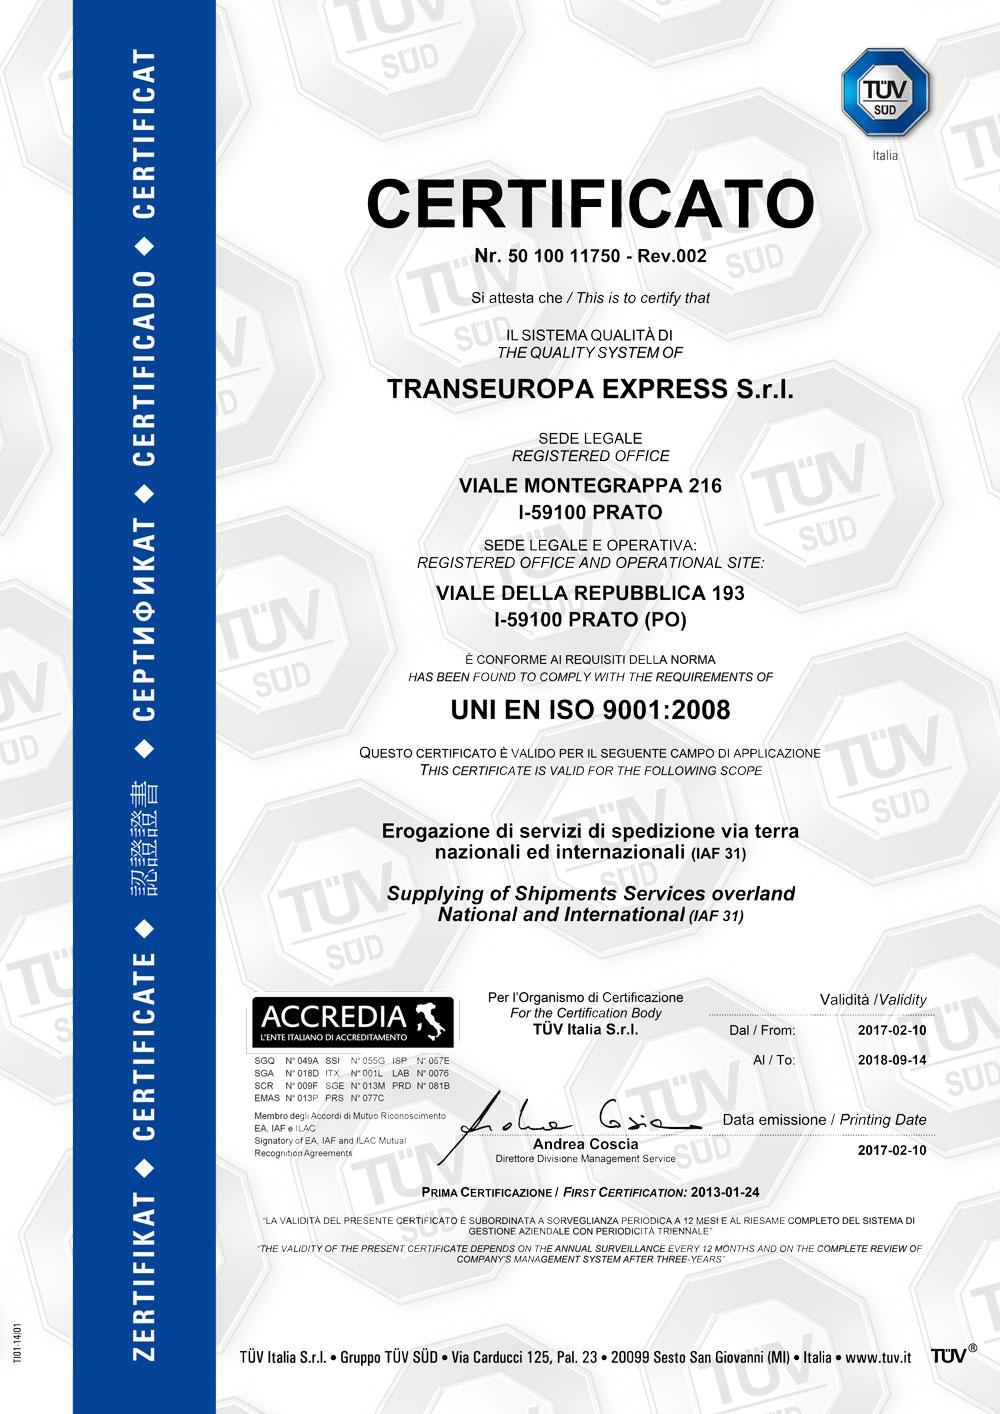 certificato-tuv-iso-9001